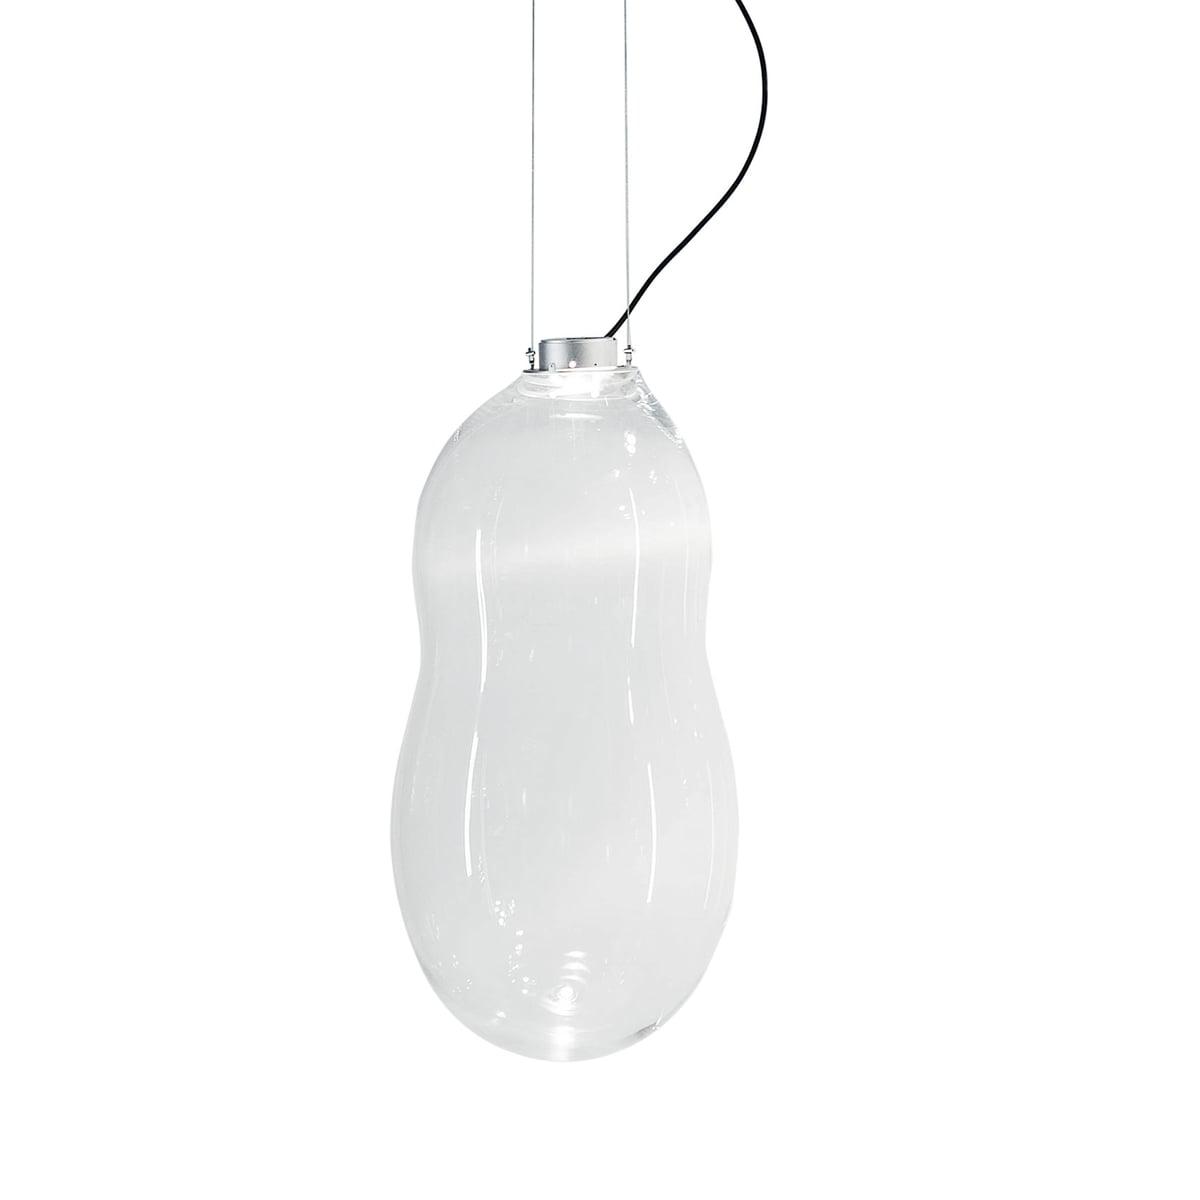 Dark the baby bubble pendant light transparent excl driver